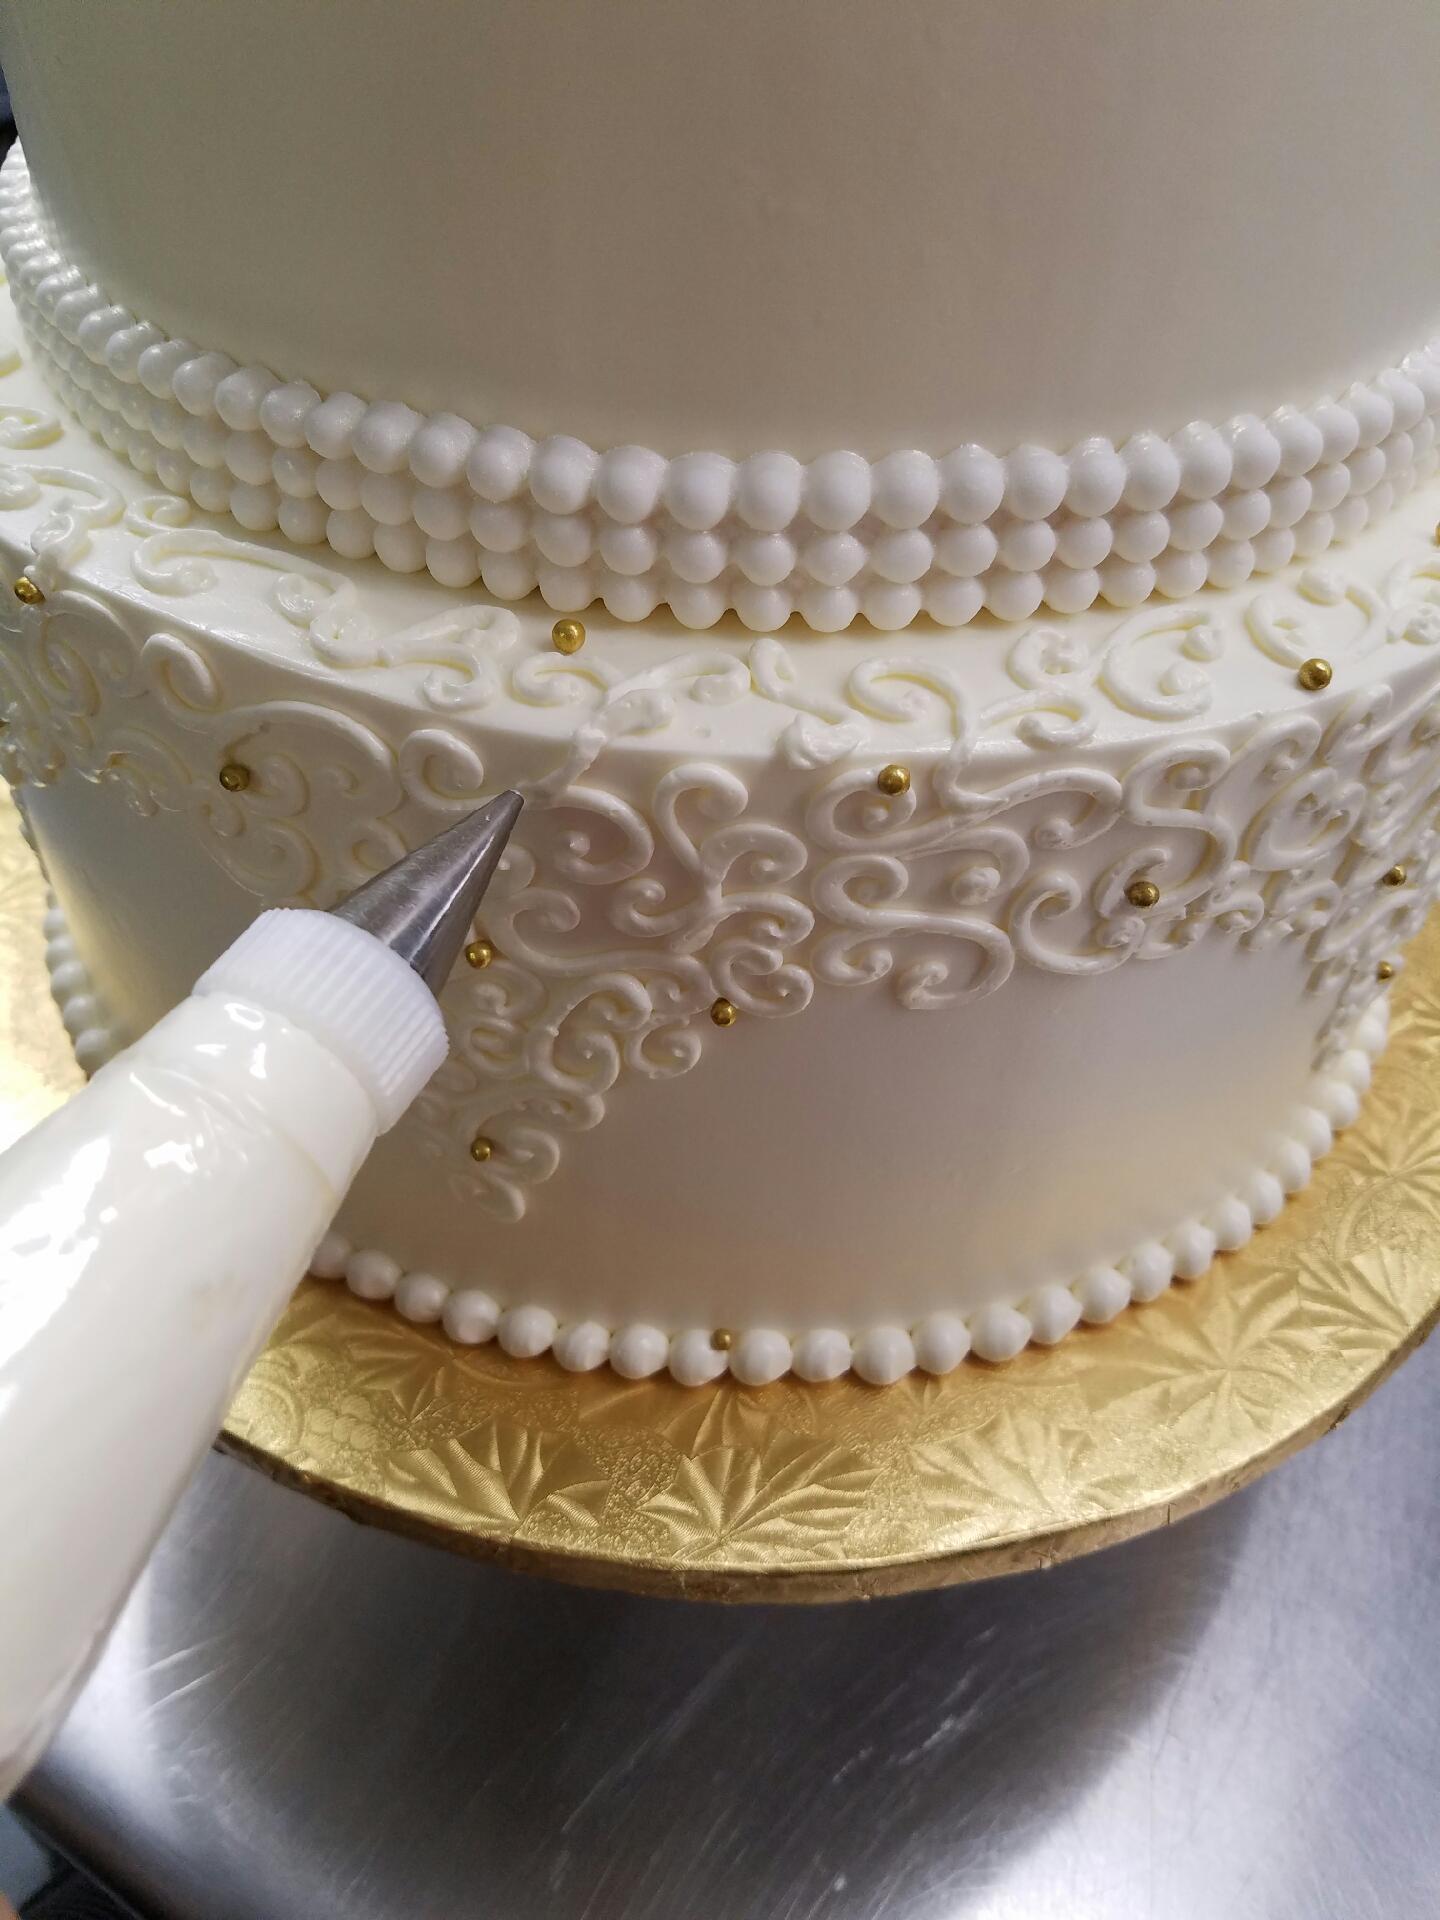 Cake decorating dunedin fine art center for Art cake decoration